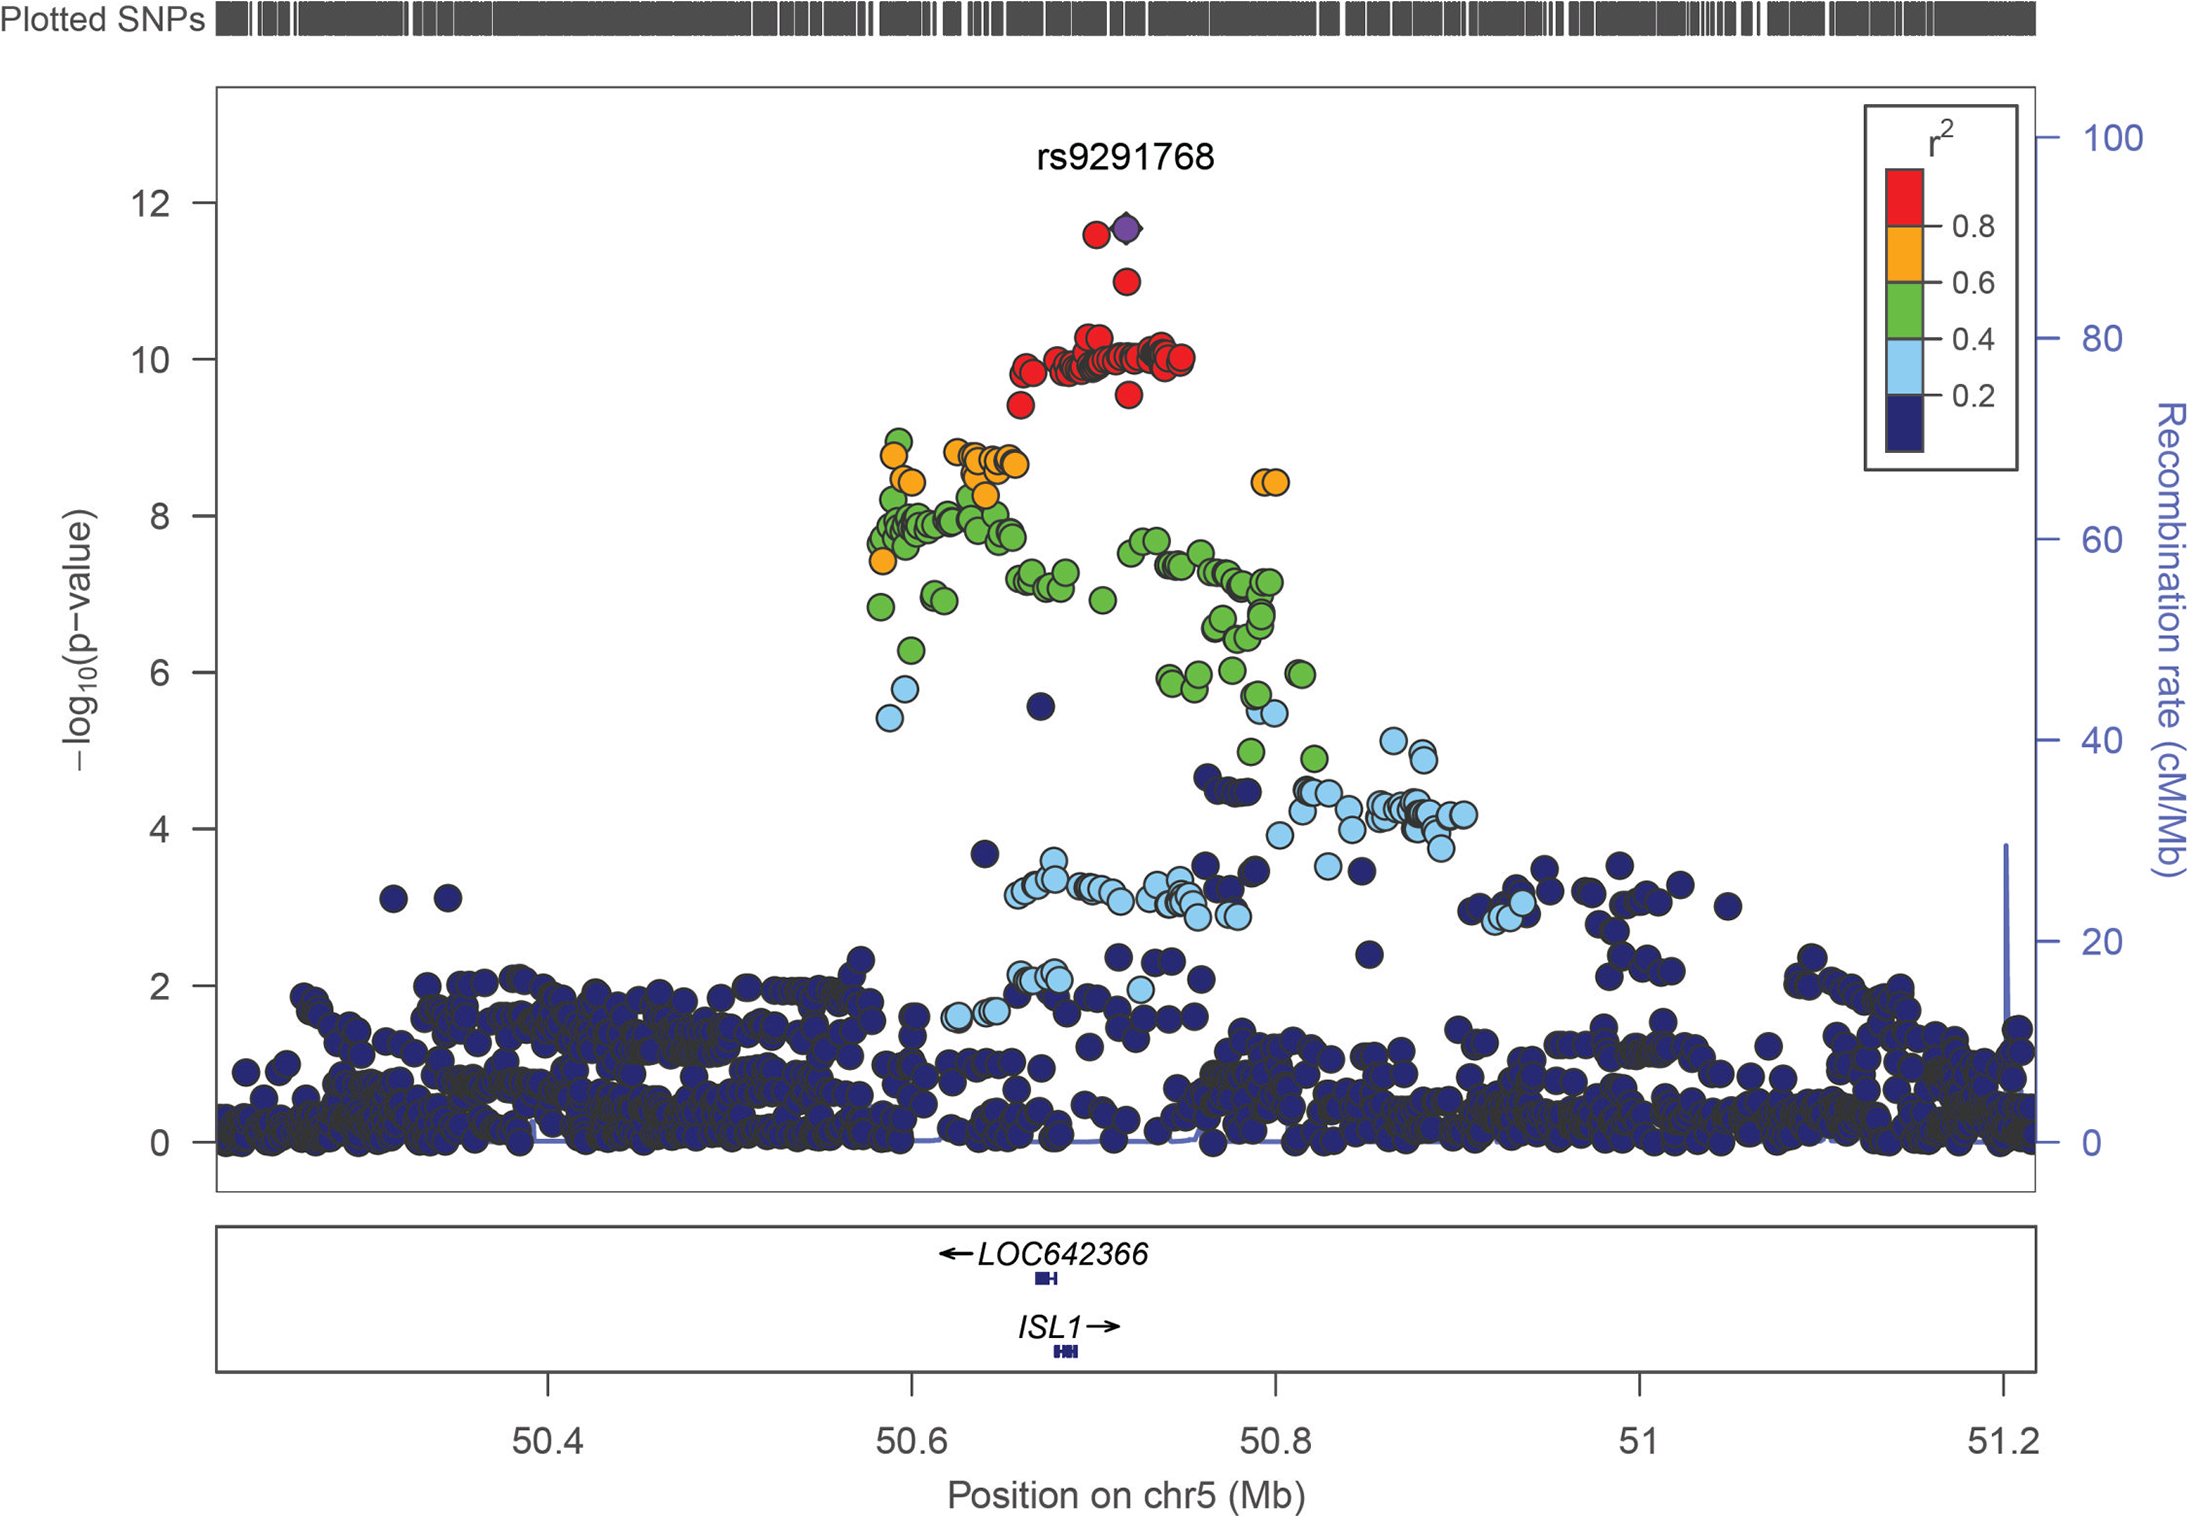 Regional association plot for <i>ISL1</i> across a 1.0 Mb window.